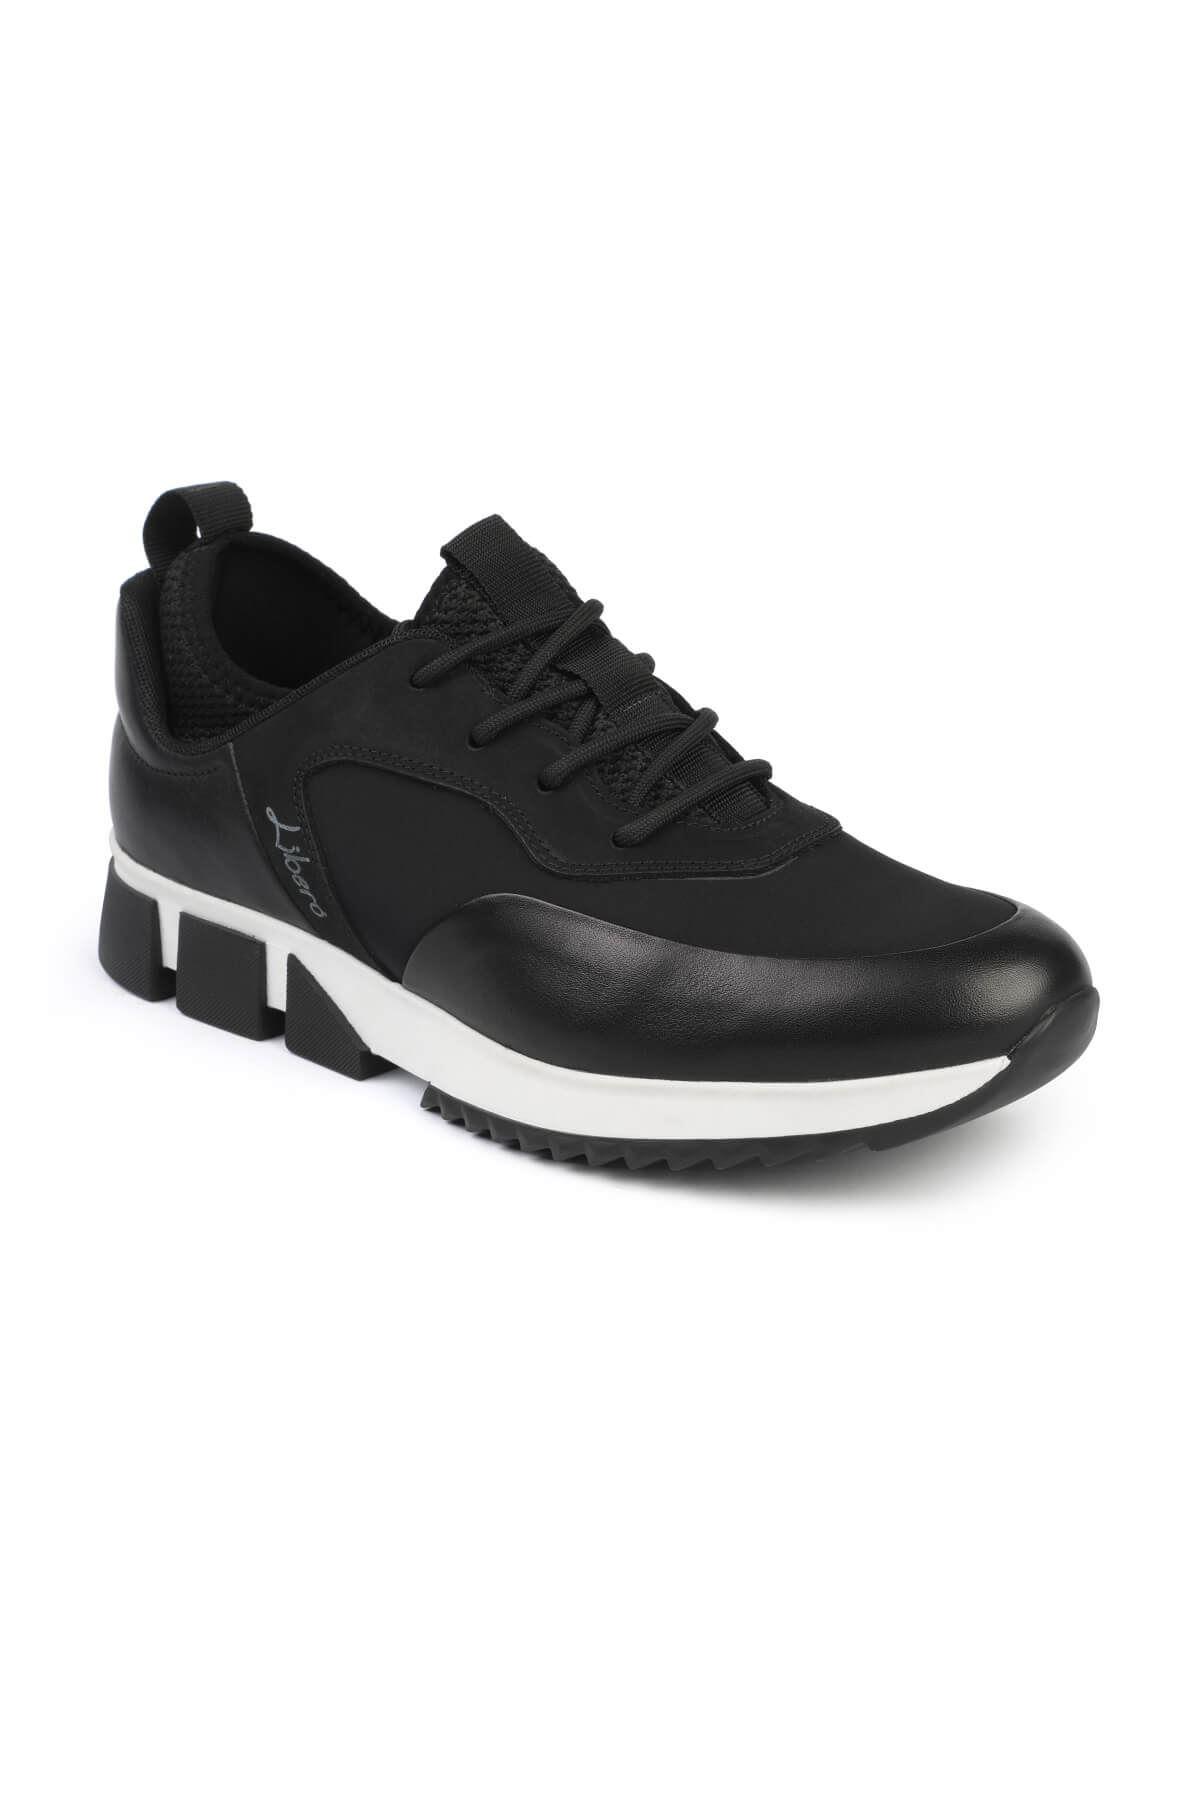 Libero 3130 Black Sports Shoes